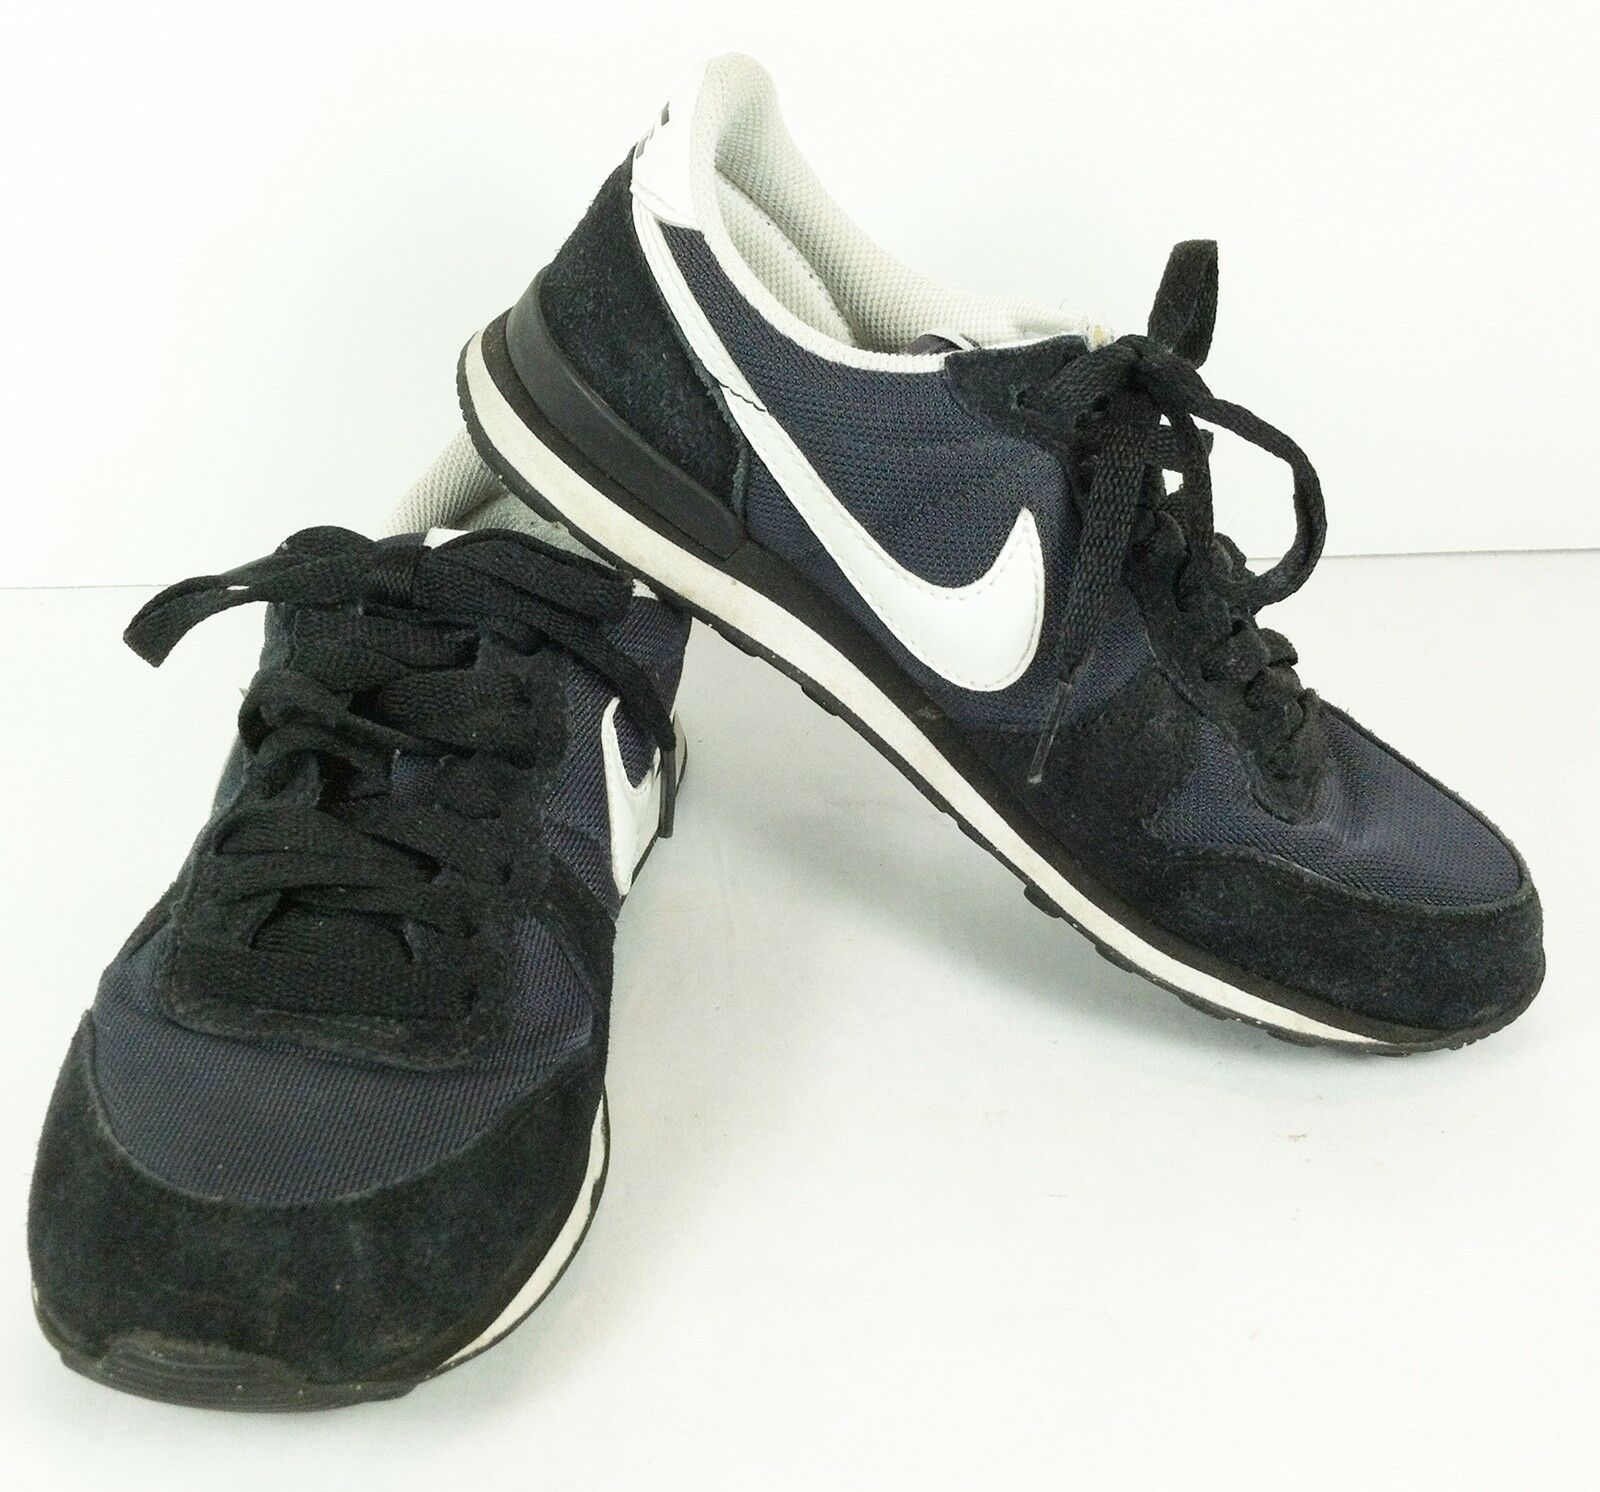 Retro Nike Internationalist Vintage Black Whit Womens Sneakers Sz 5.5 316374-013 Wild casual shoes